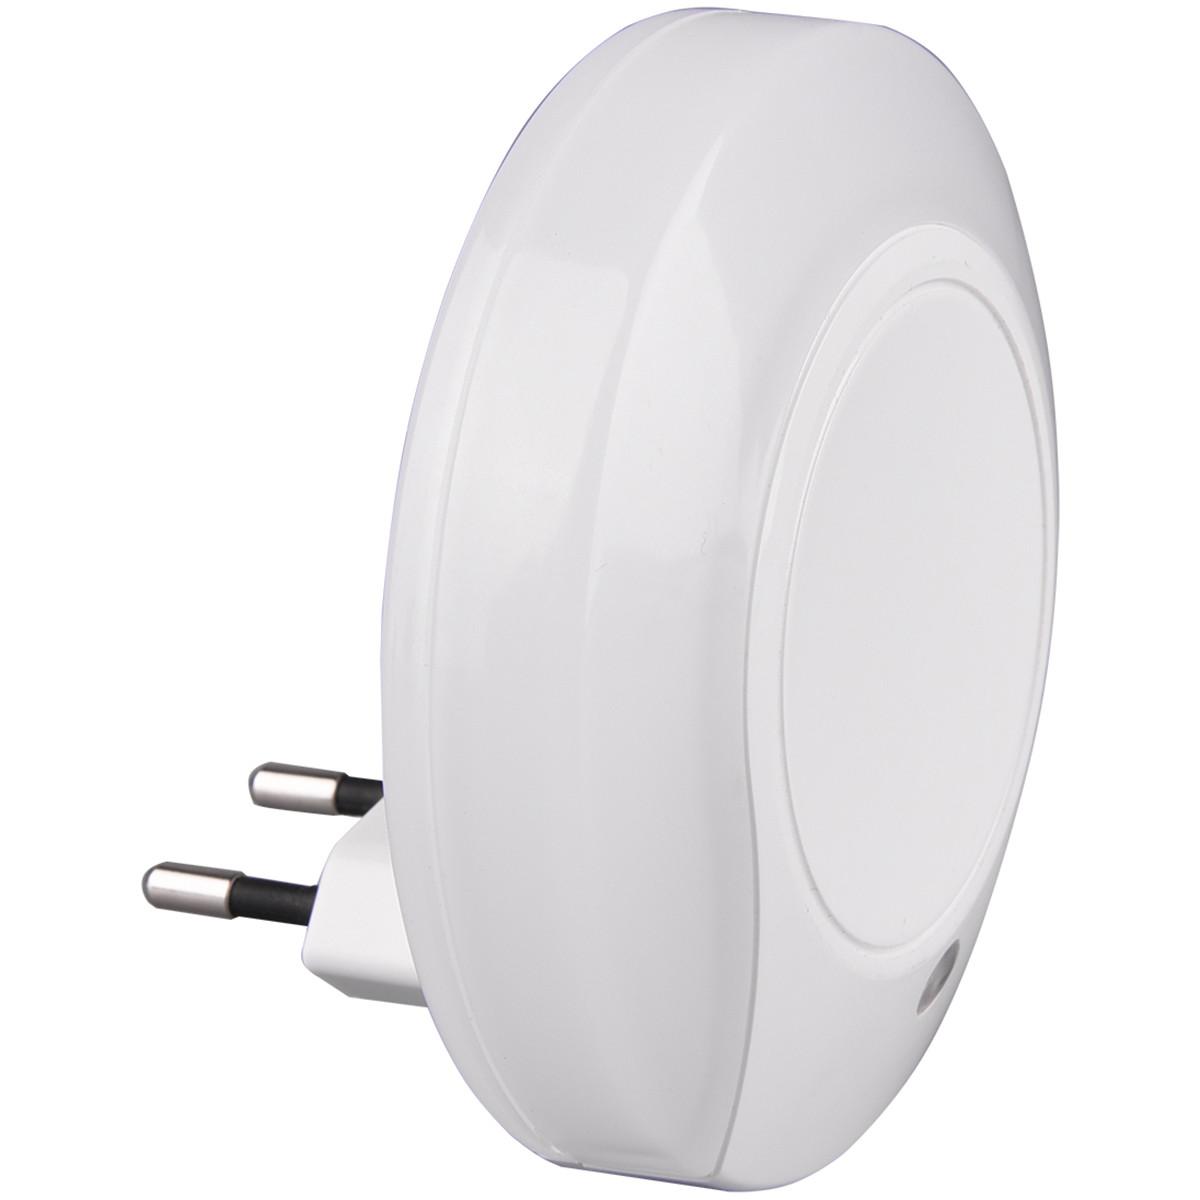 Stekkerlamp Lamp - Stekkerspot met Dag en Nacht Sensor Incl. Schakelaar - Trion Jiko - 0.4W - Warm W